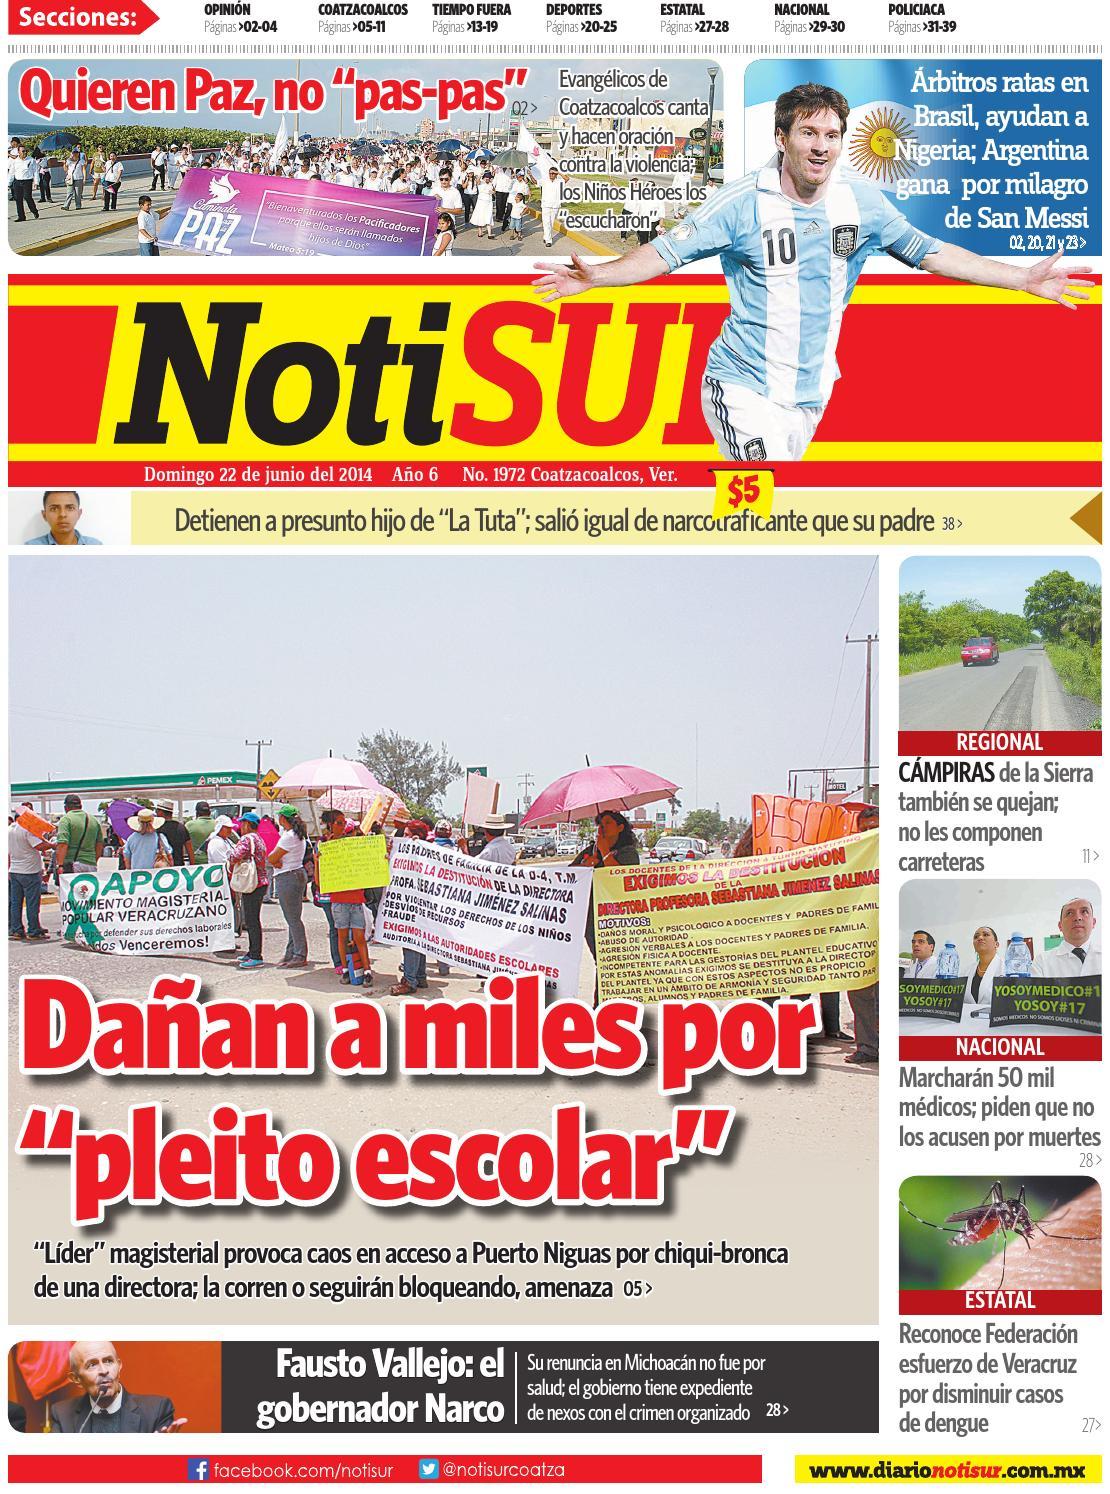 NotiSUR 22 de junio 2014 by Diario NotiSUR Coatzacoalcos 2014 - issuu 825a35cce3867